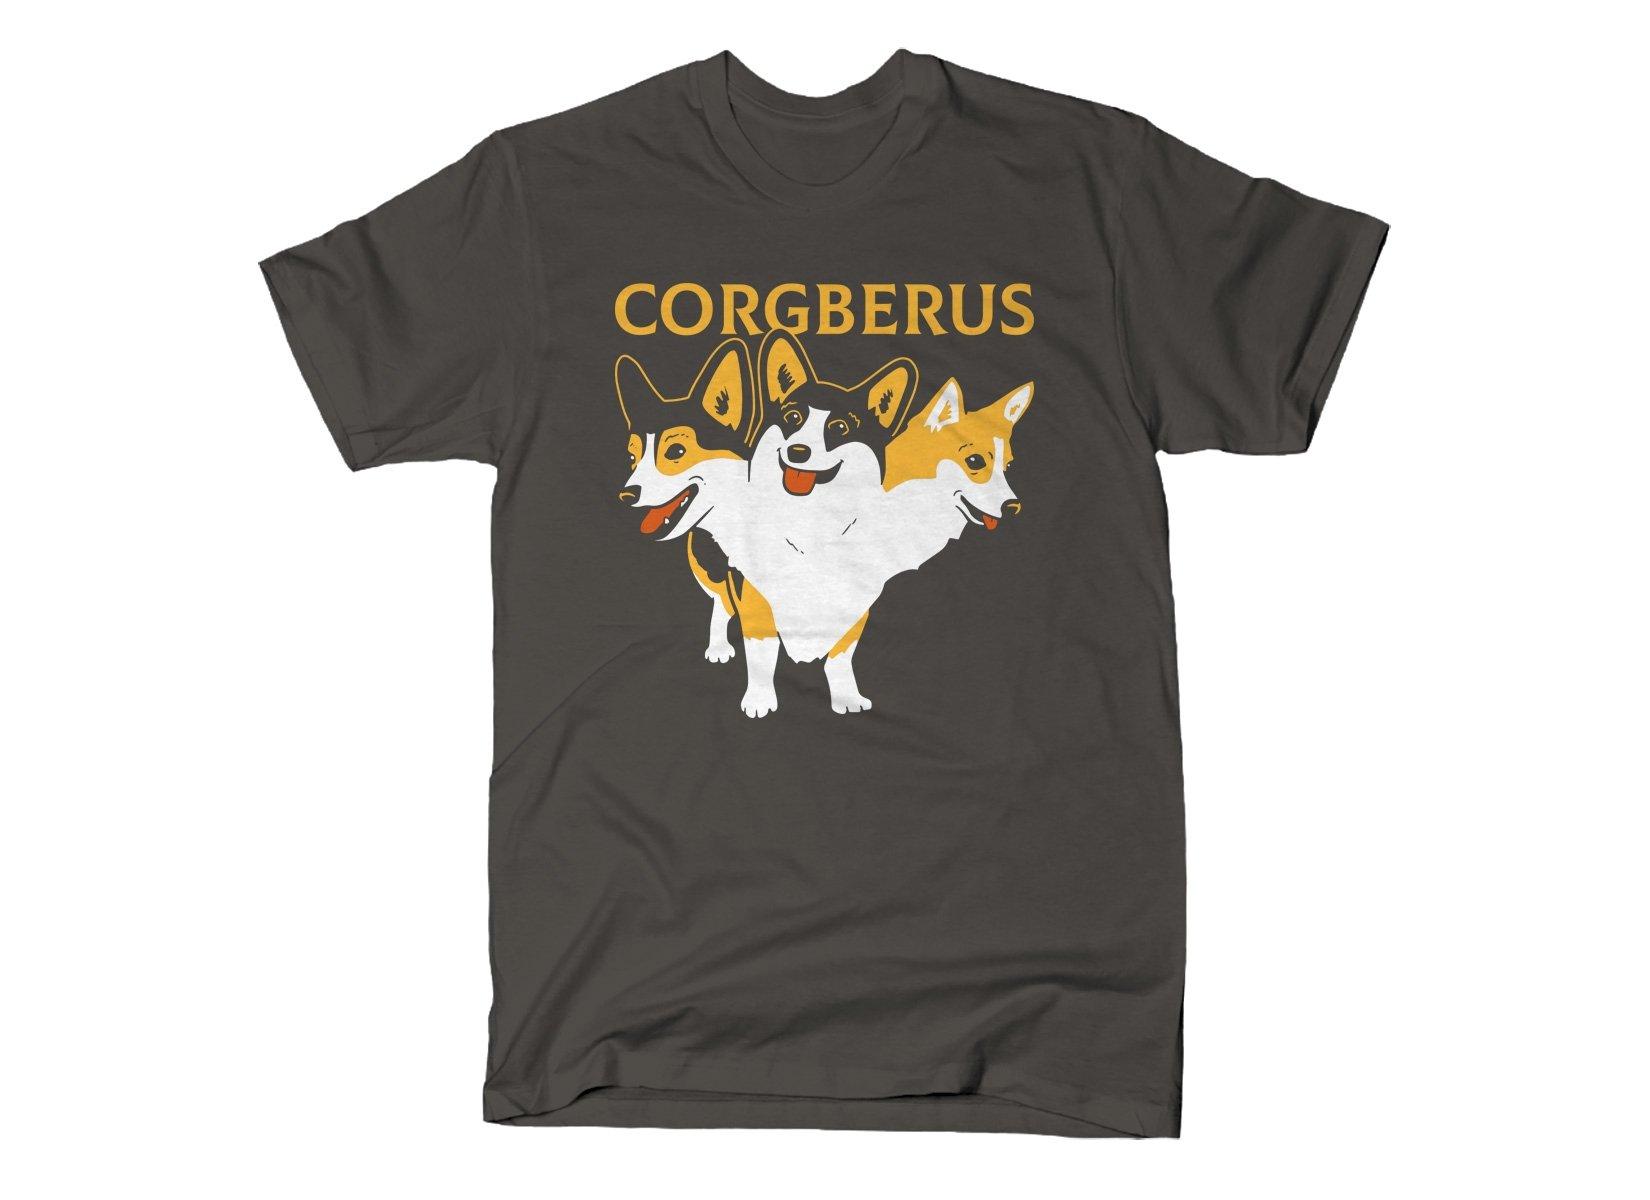 Corgberus